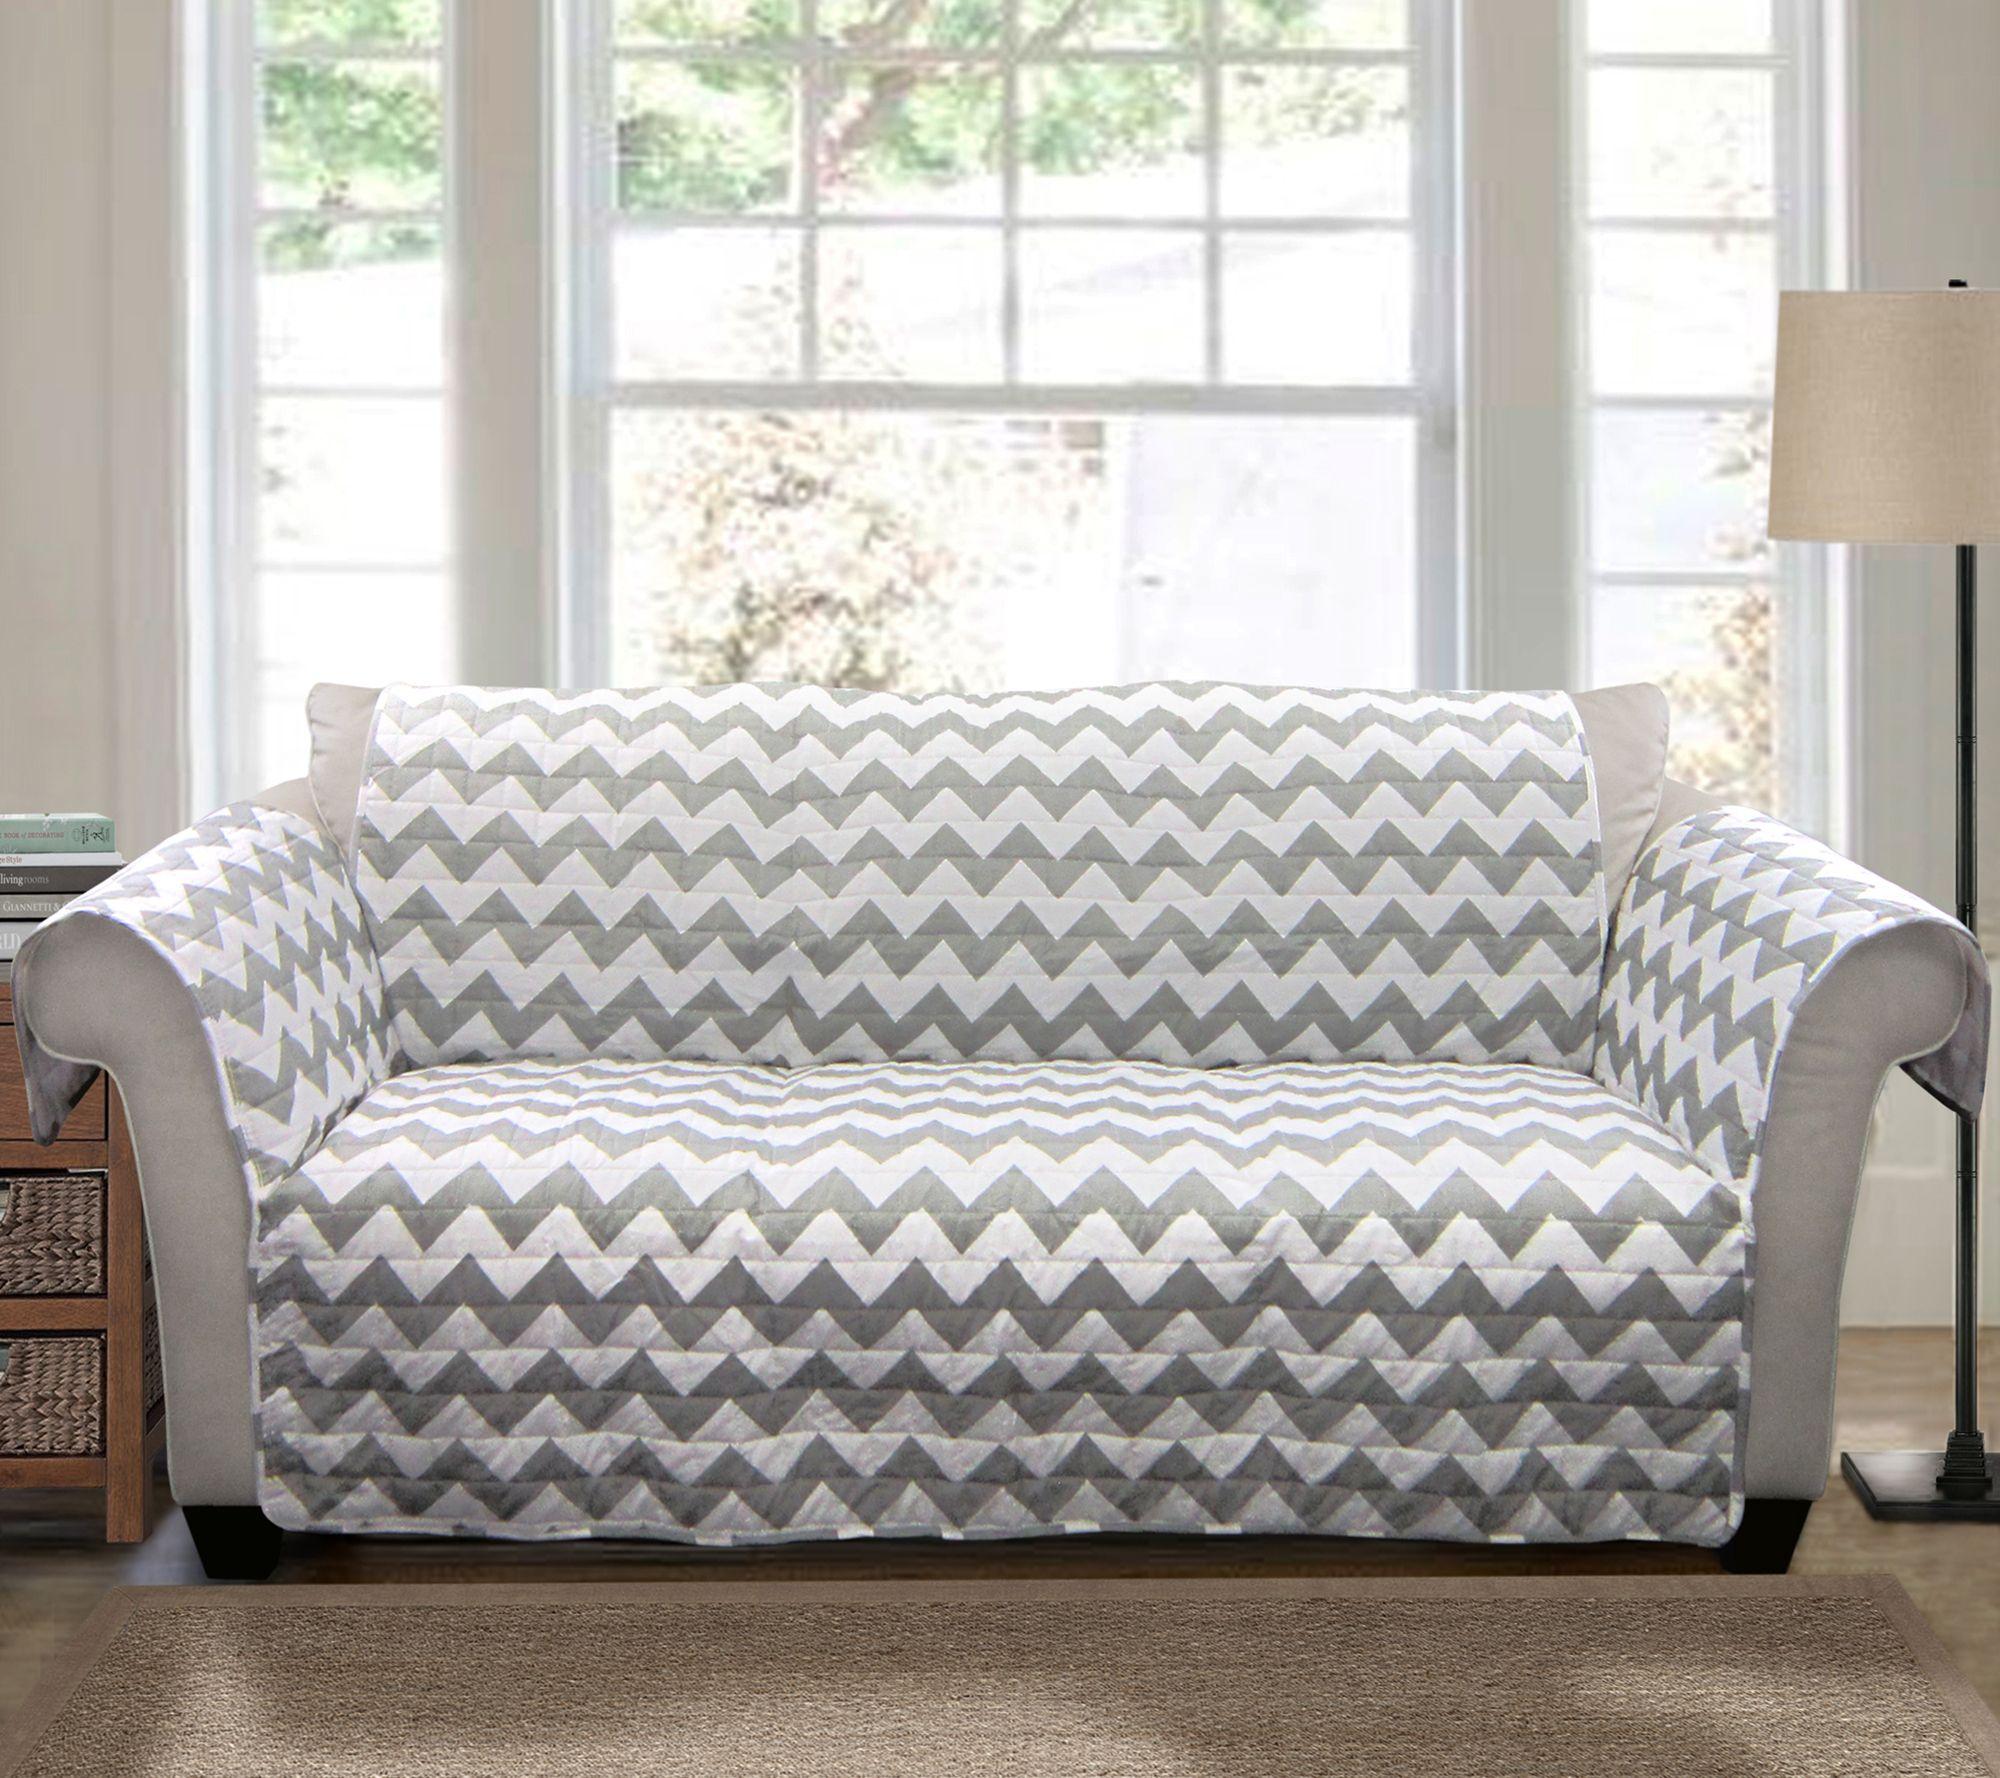 Gray Chevron Love Seat Furniture Protector by Lush Decor — QVC